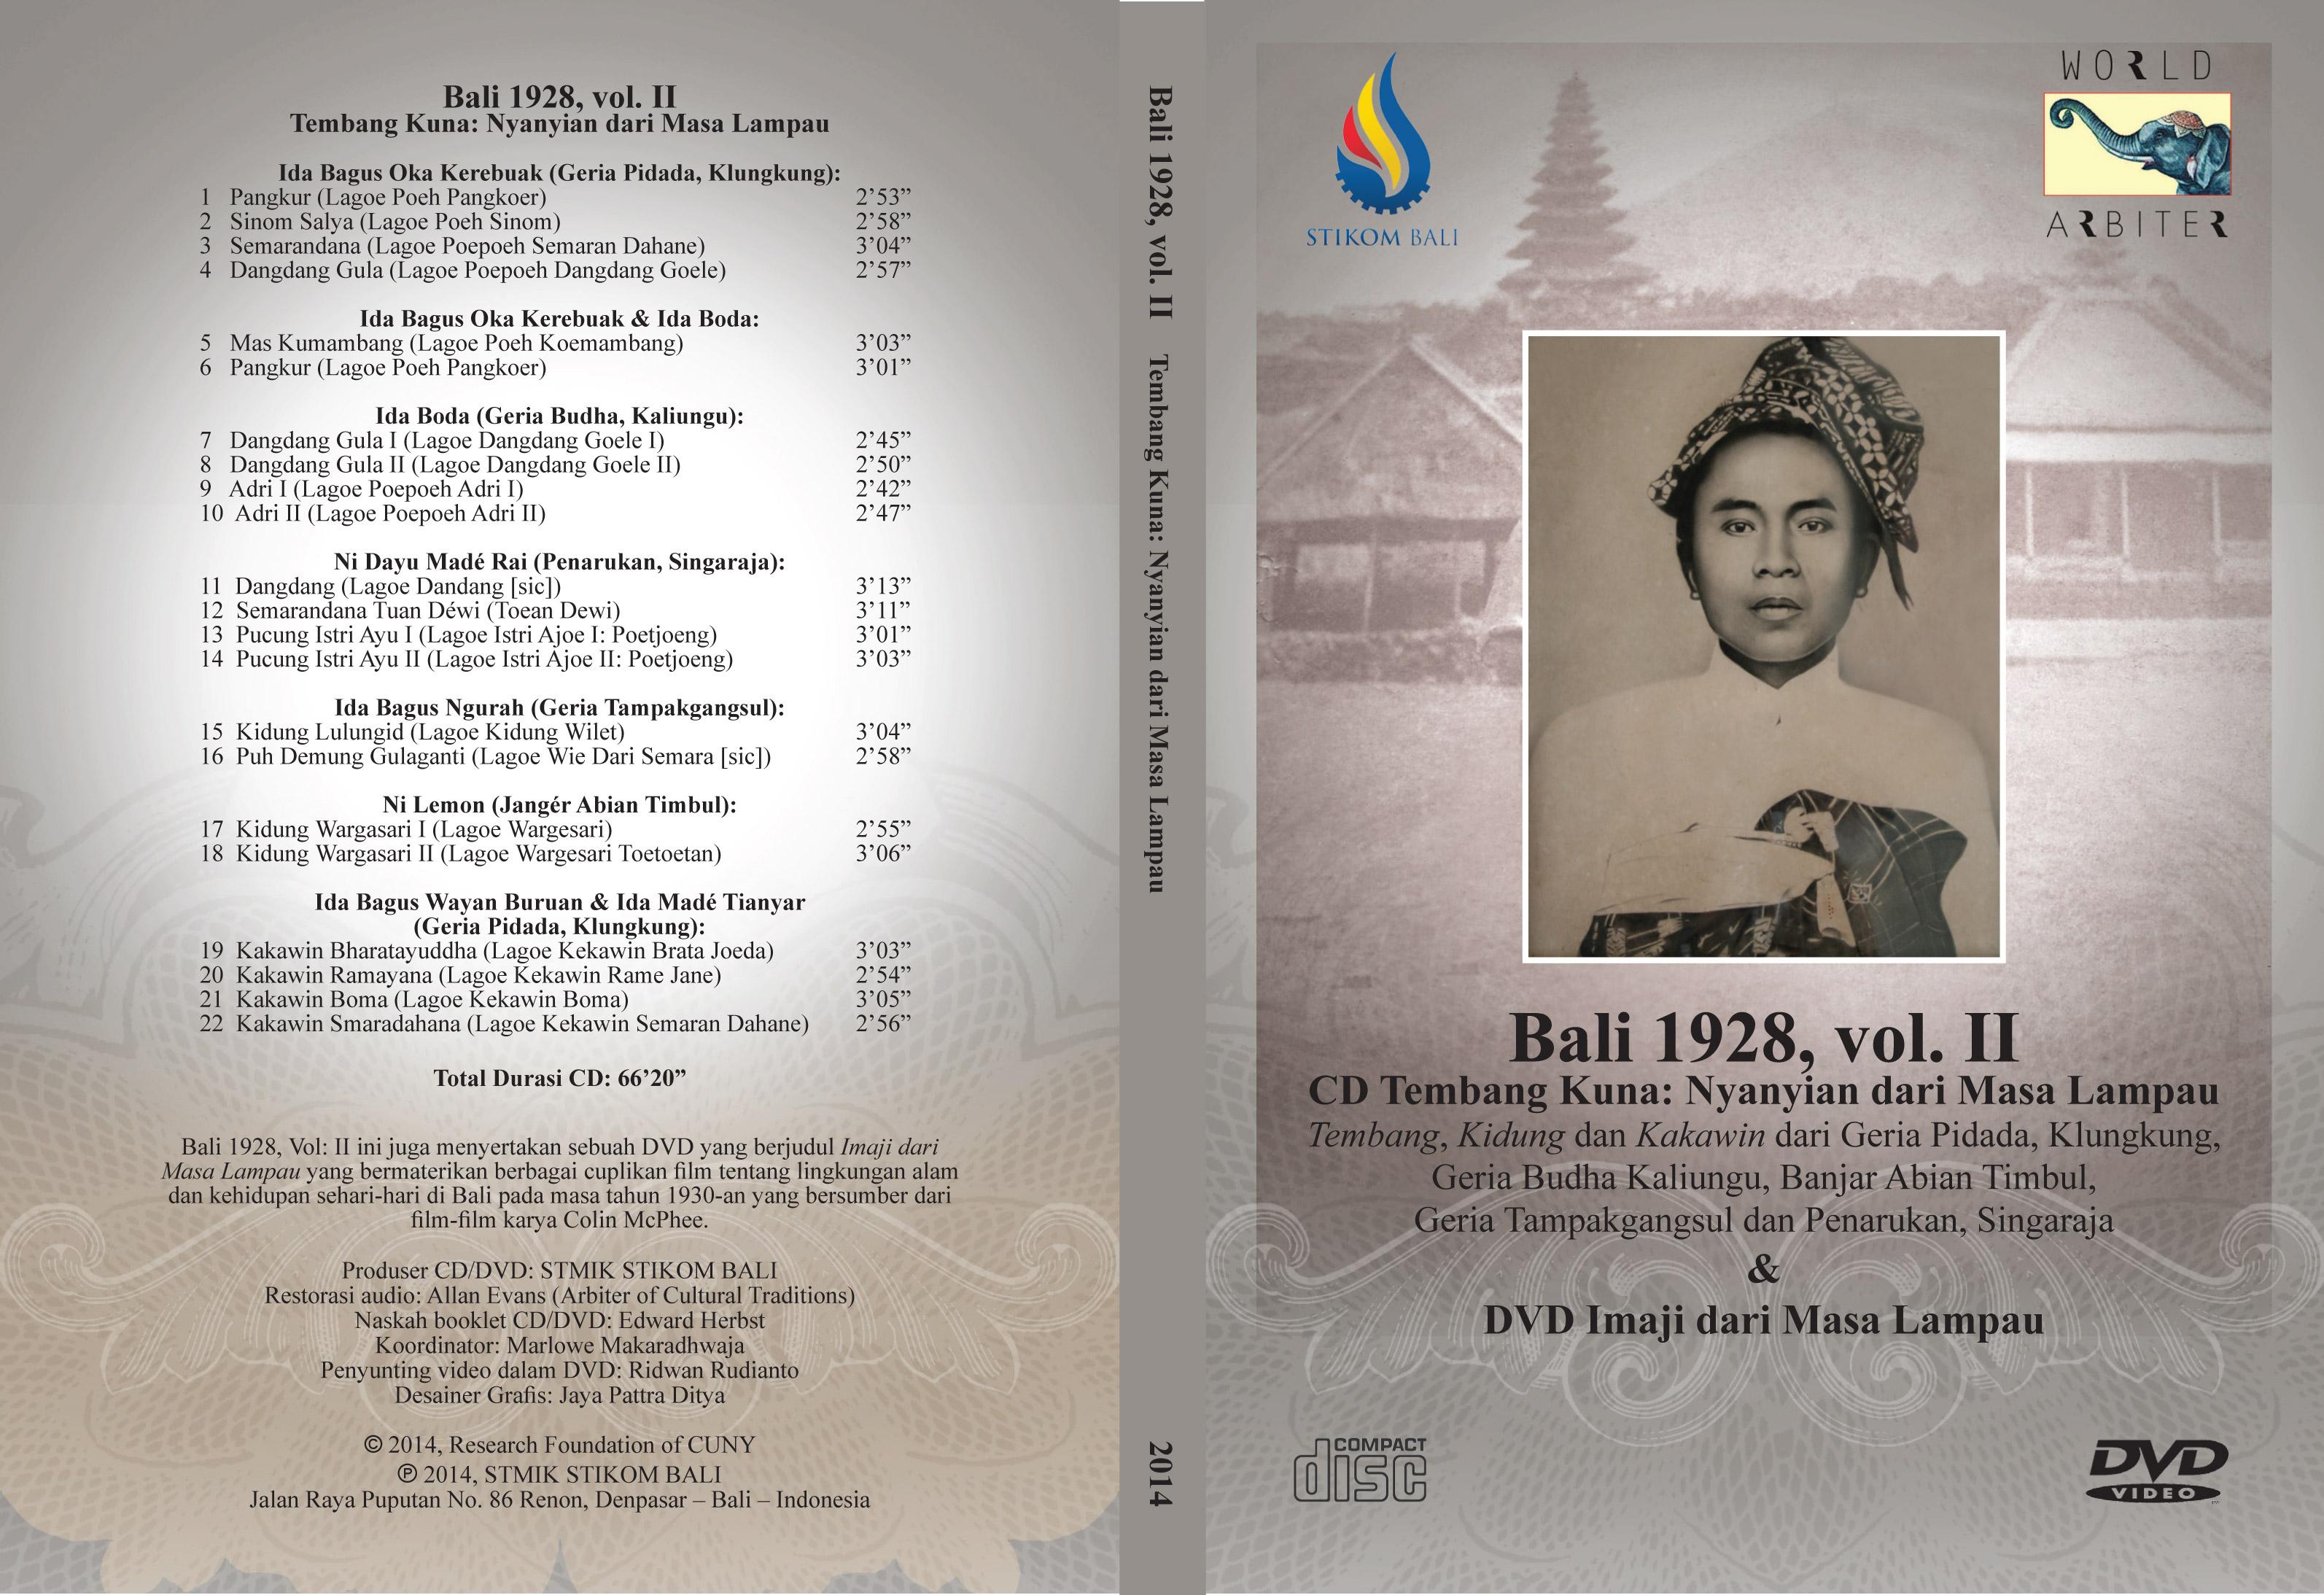 Bali-1928-Vol-II